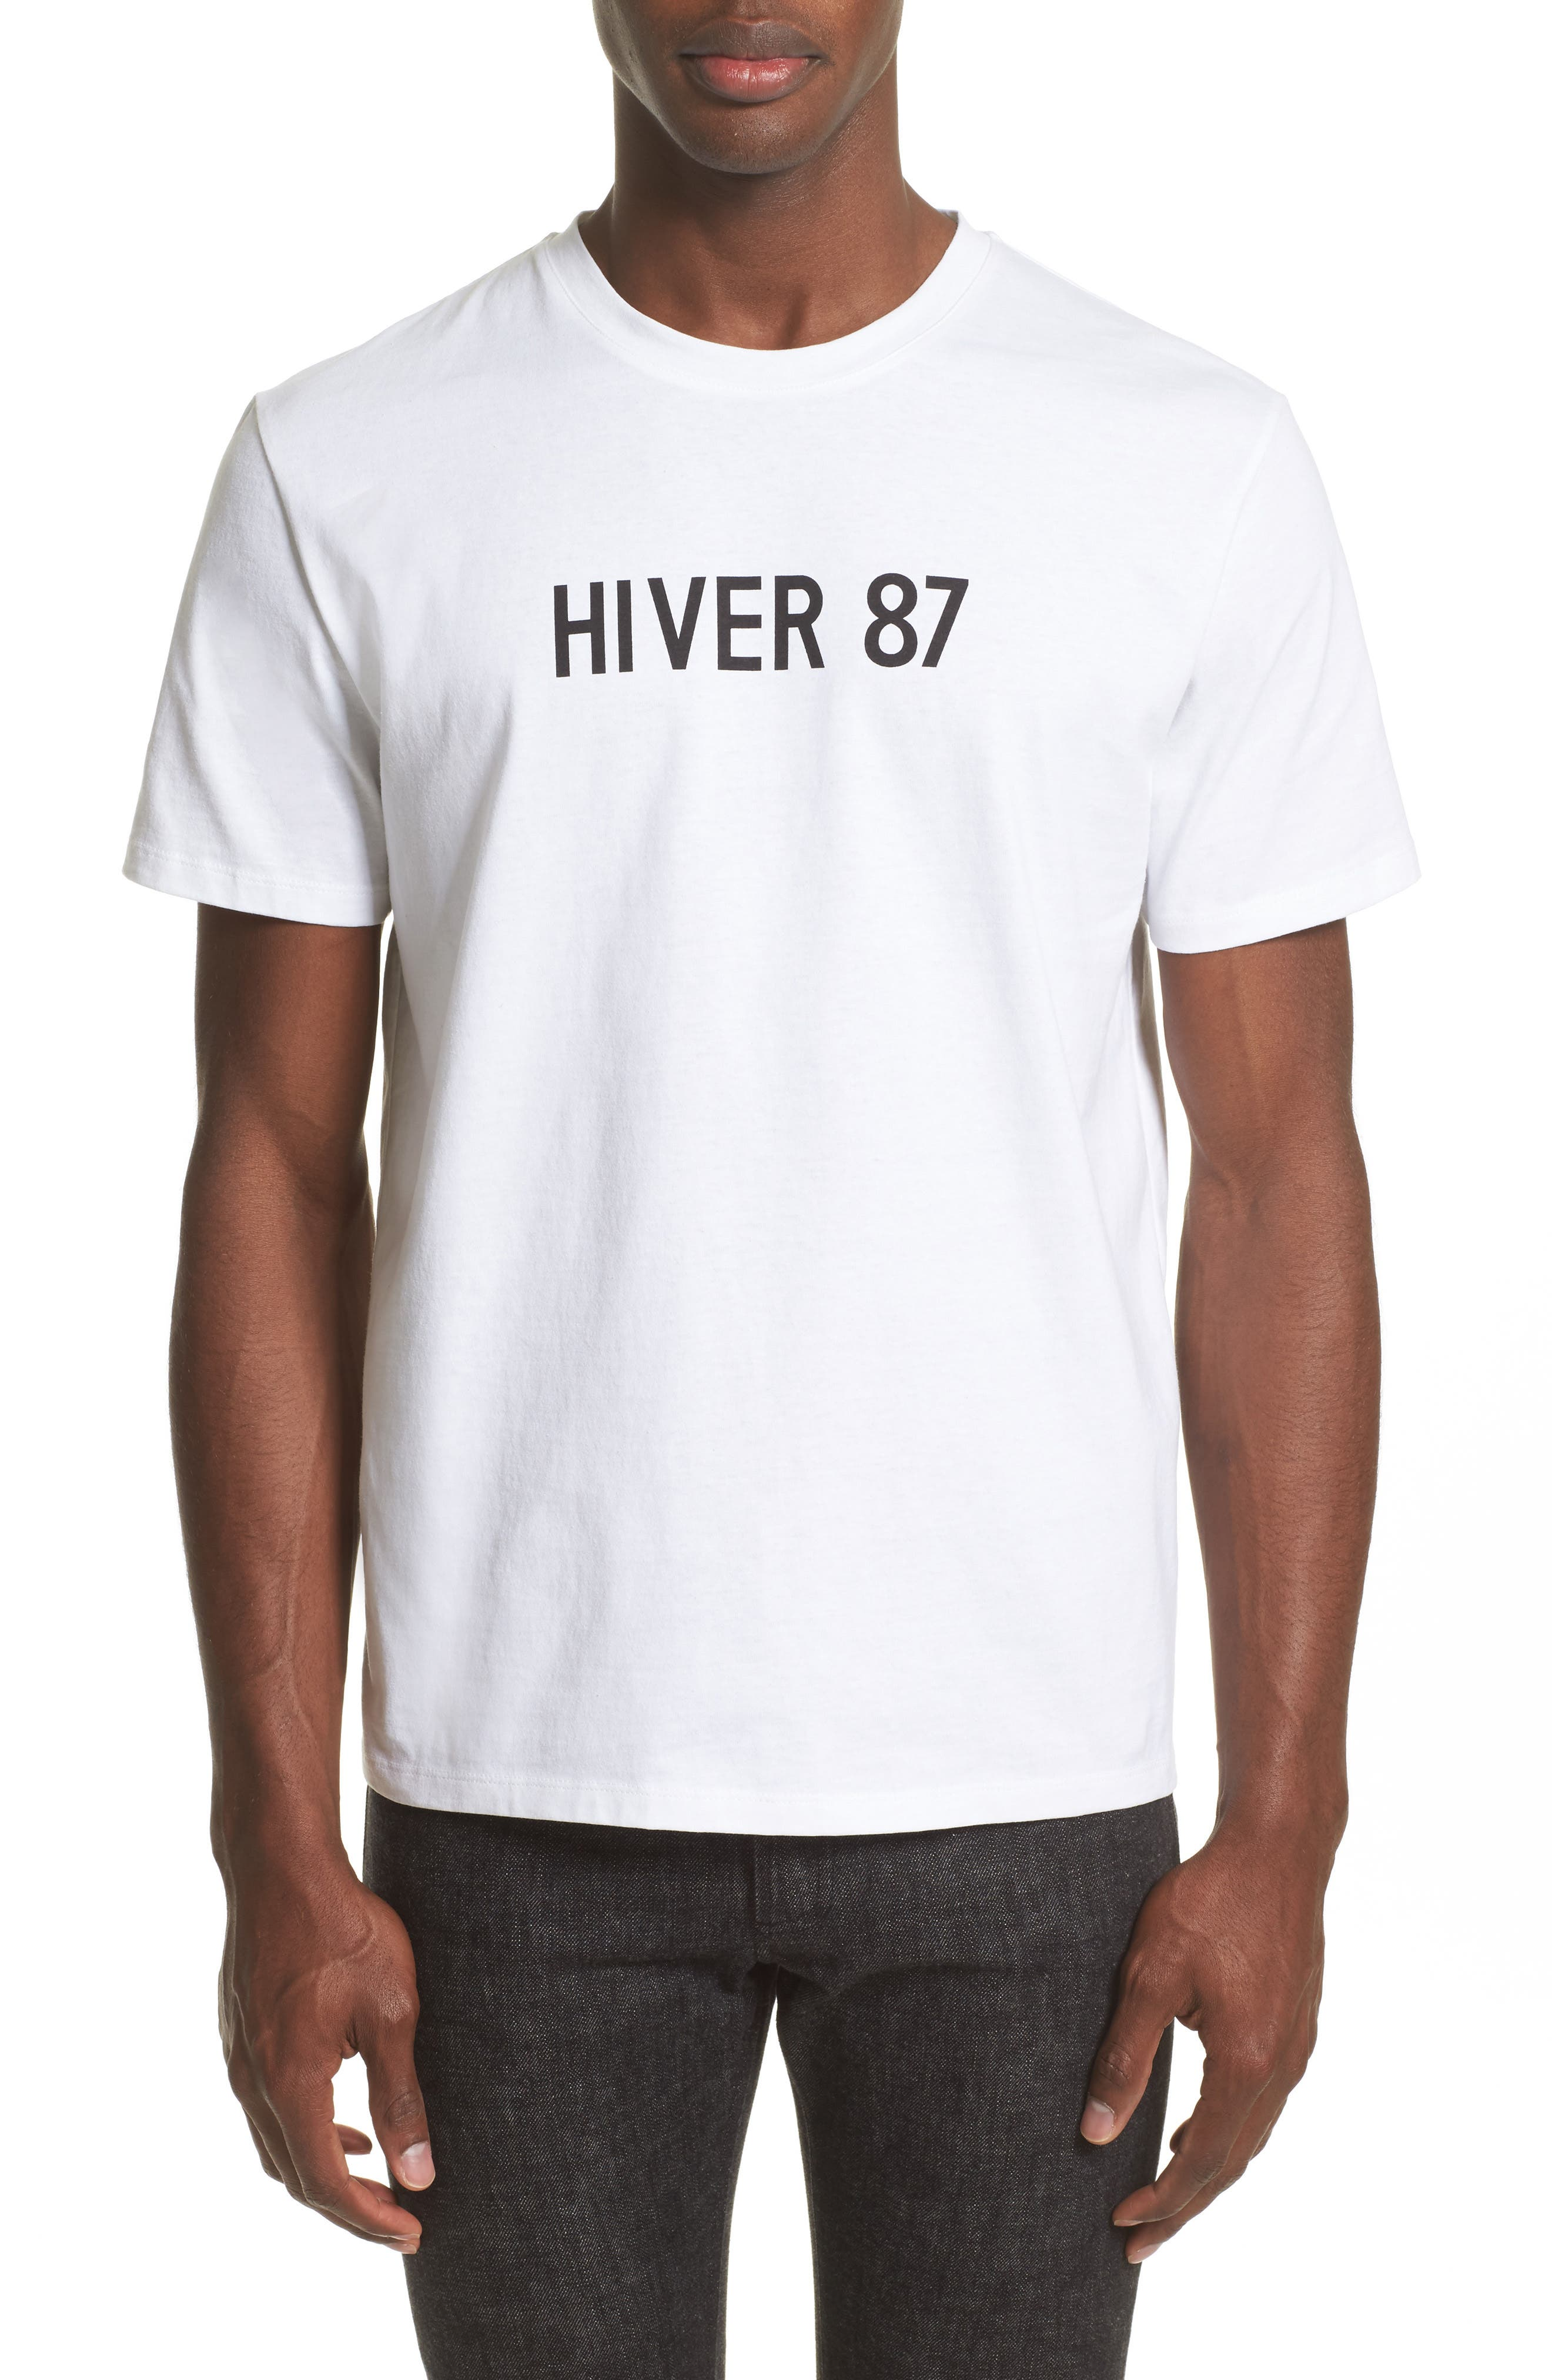 A.P.C. Hiver 87 T-Shirt